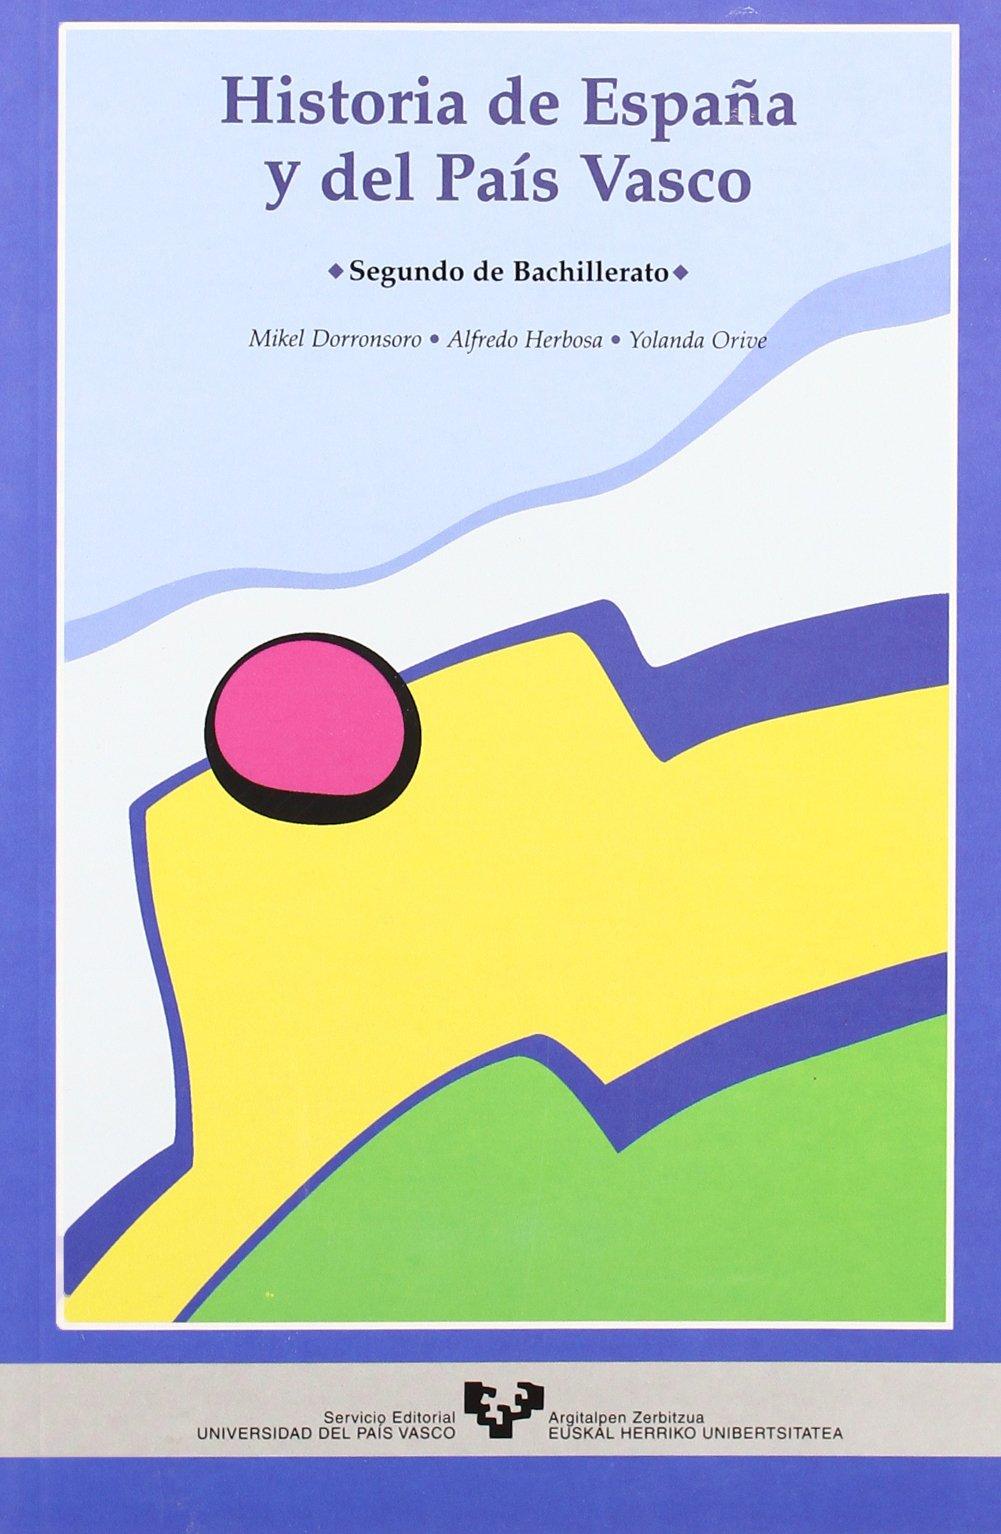 Historia de España y del País Vasco. Segundo de Bachillerato - 9788483730812 Zabalduz: Amazon.es: Dorronsoro Dorronsoro, Mikel, Herbosa López, Alfredo, Orive Echave, Yolanda: Libros